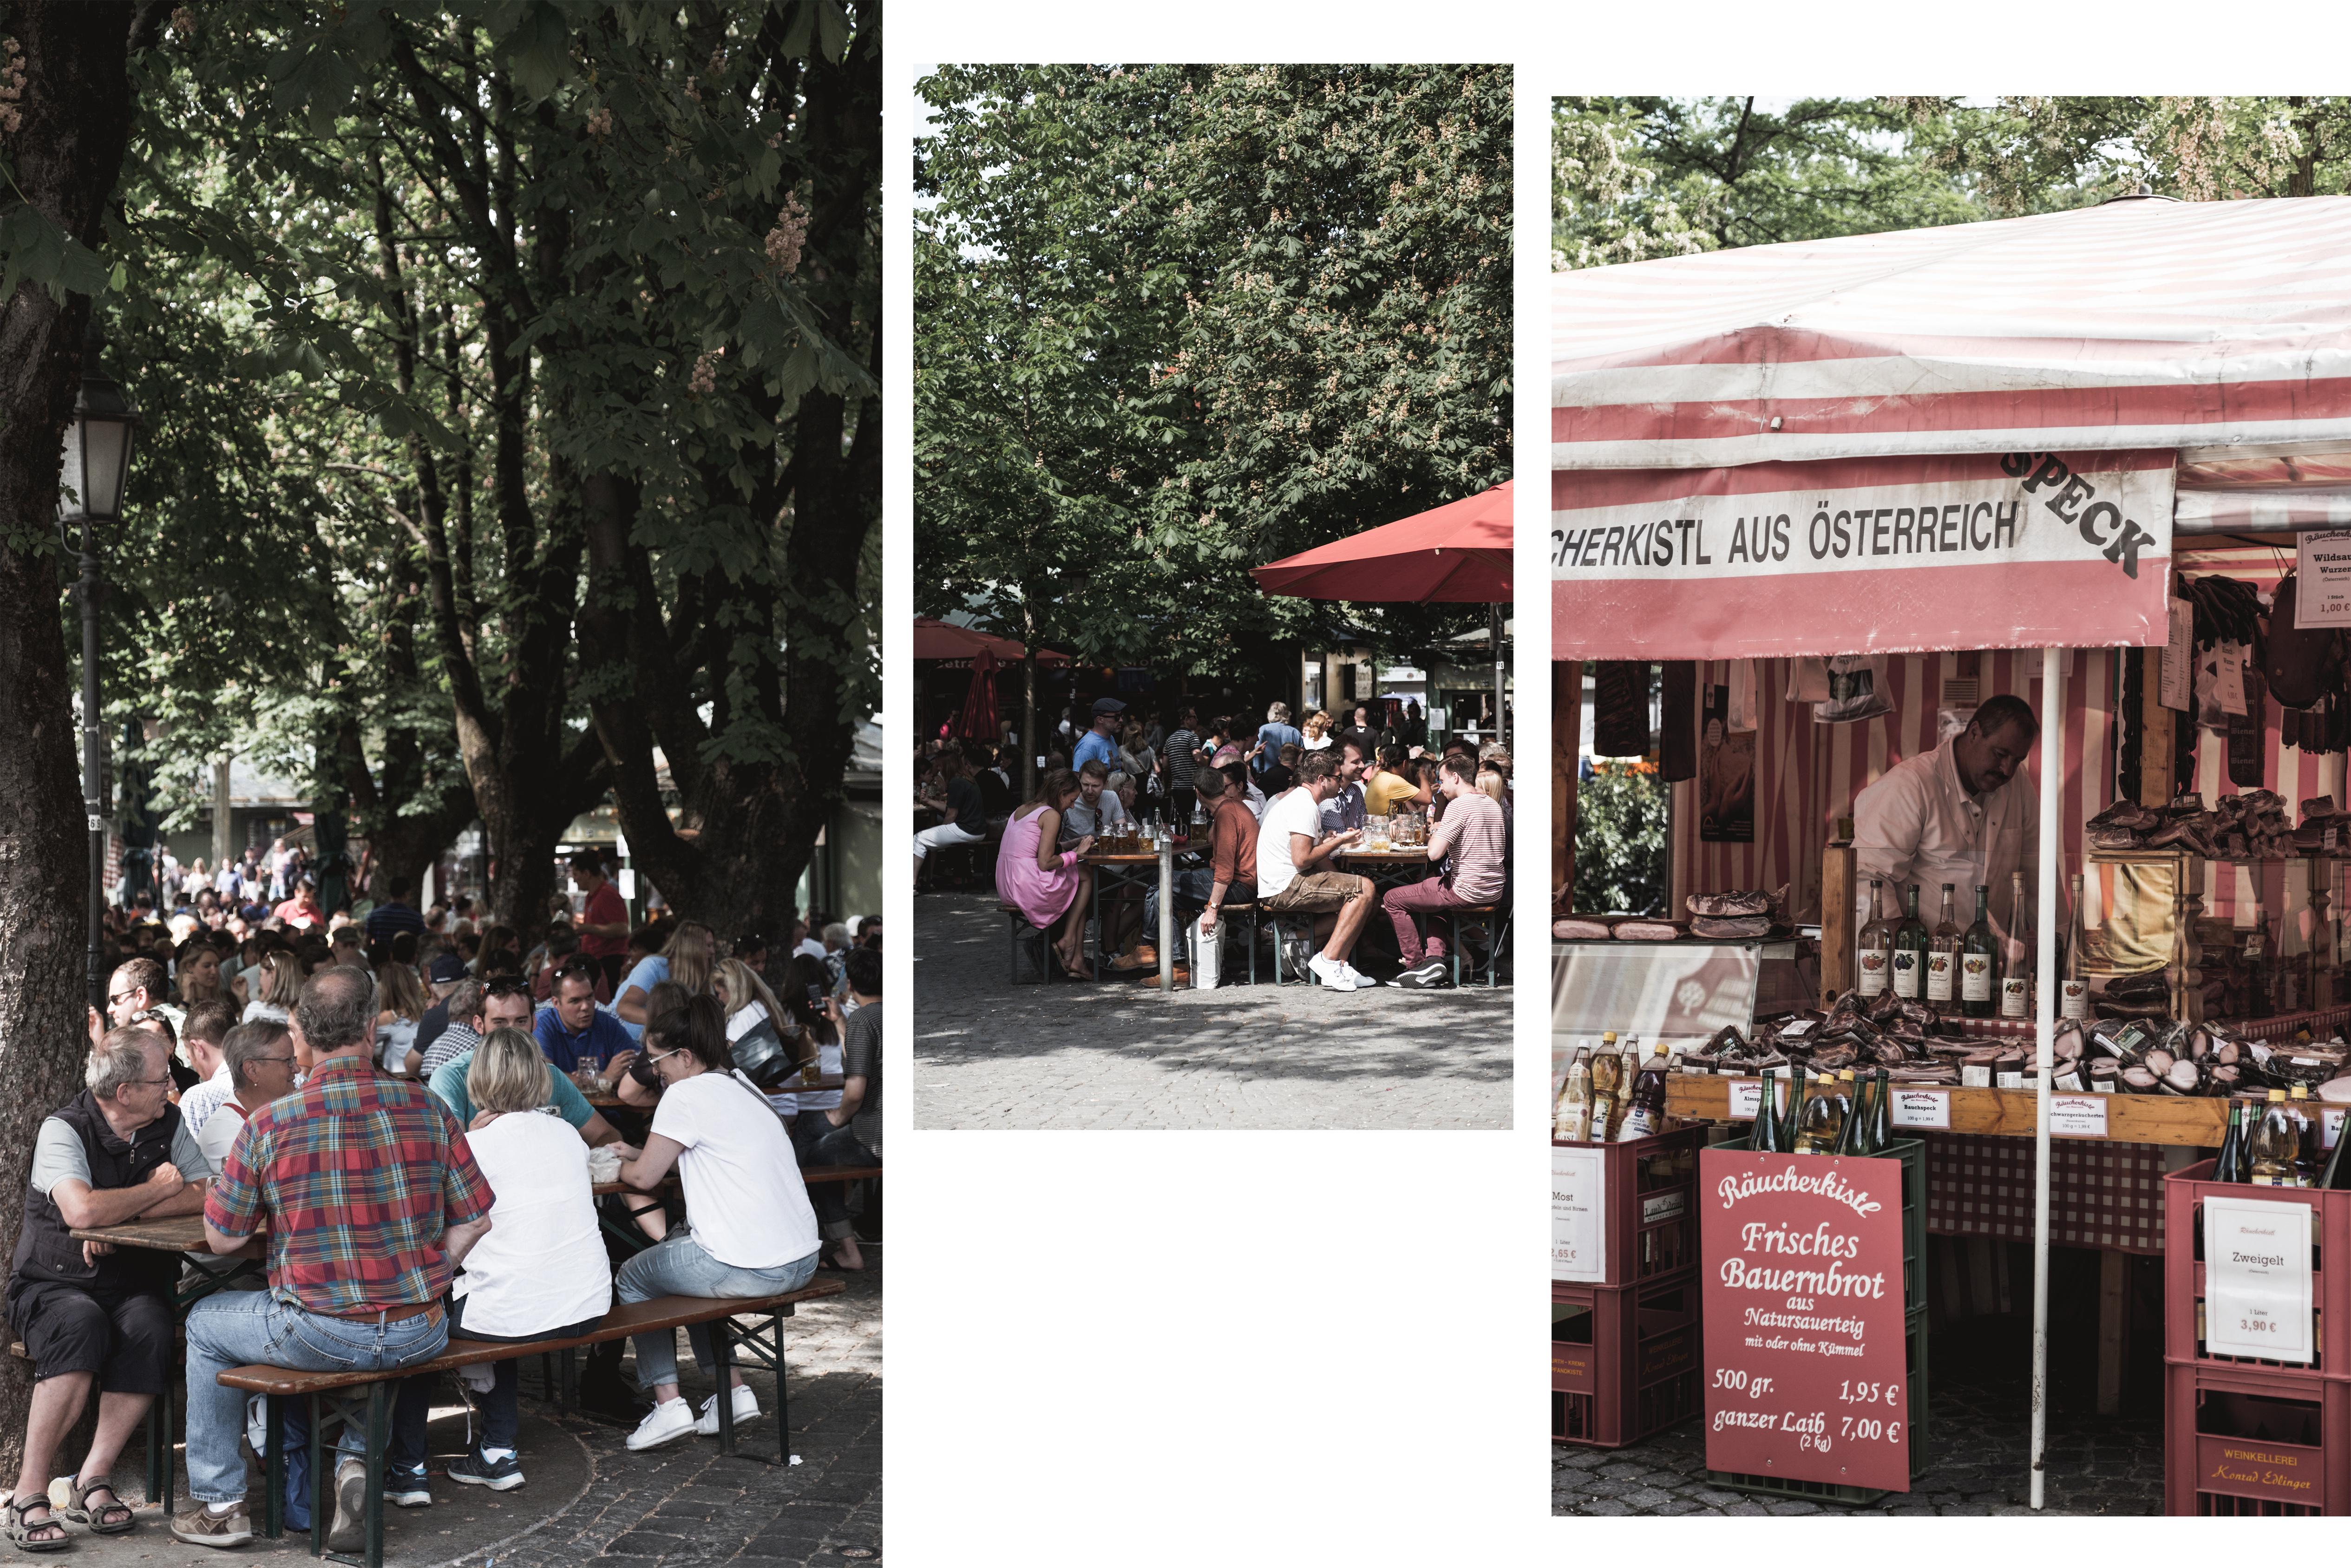 Munich-Viktualienmarkt-lemonetorange-baviere-allemagne-city guide